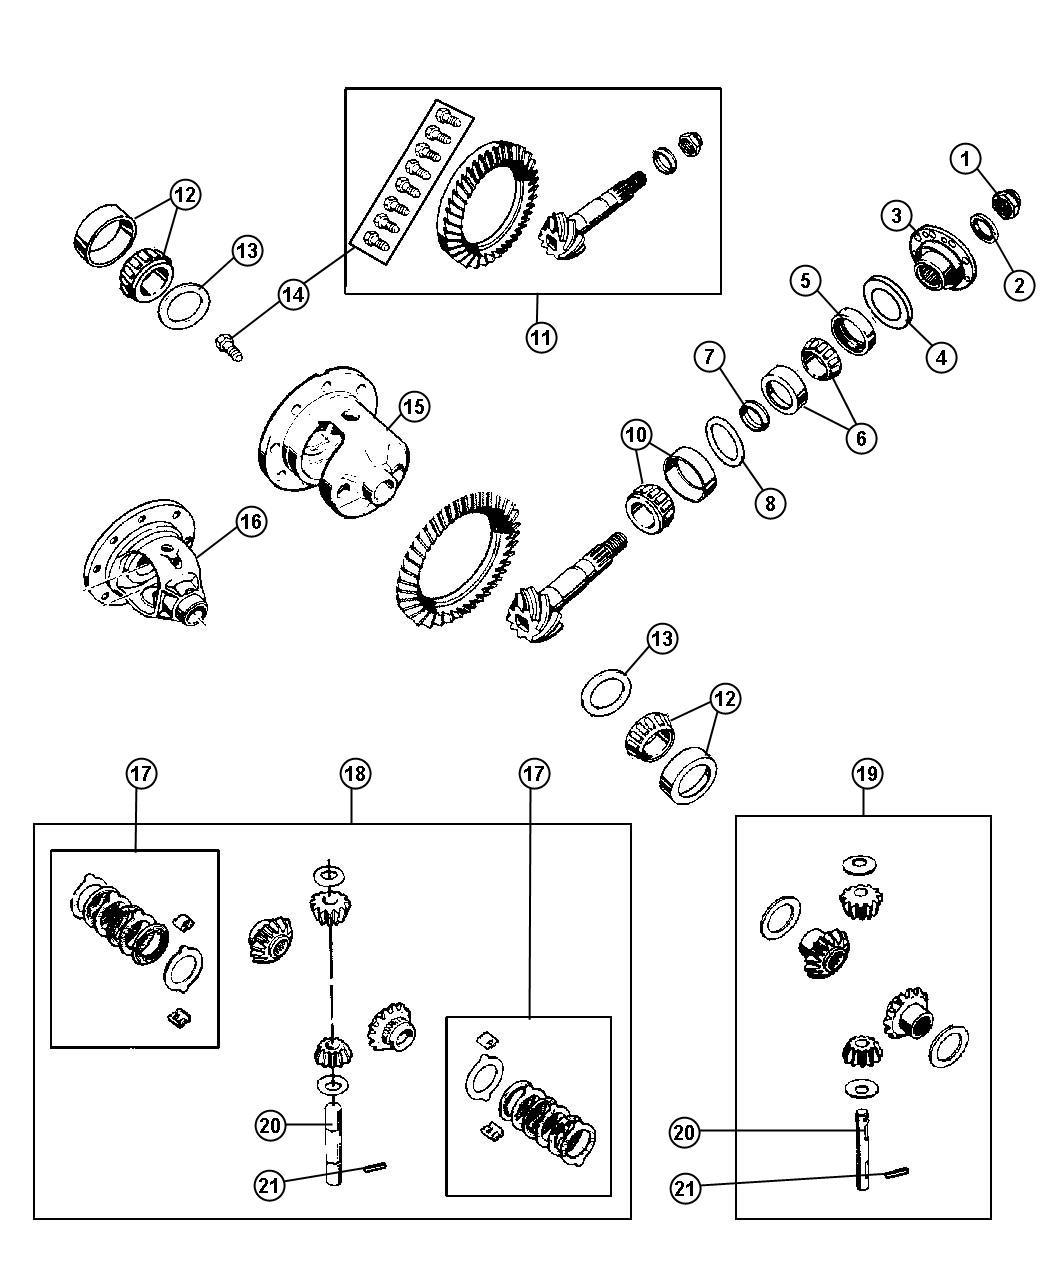 rear dana jeep 35 axle diagram html